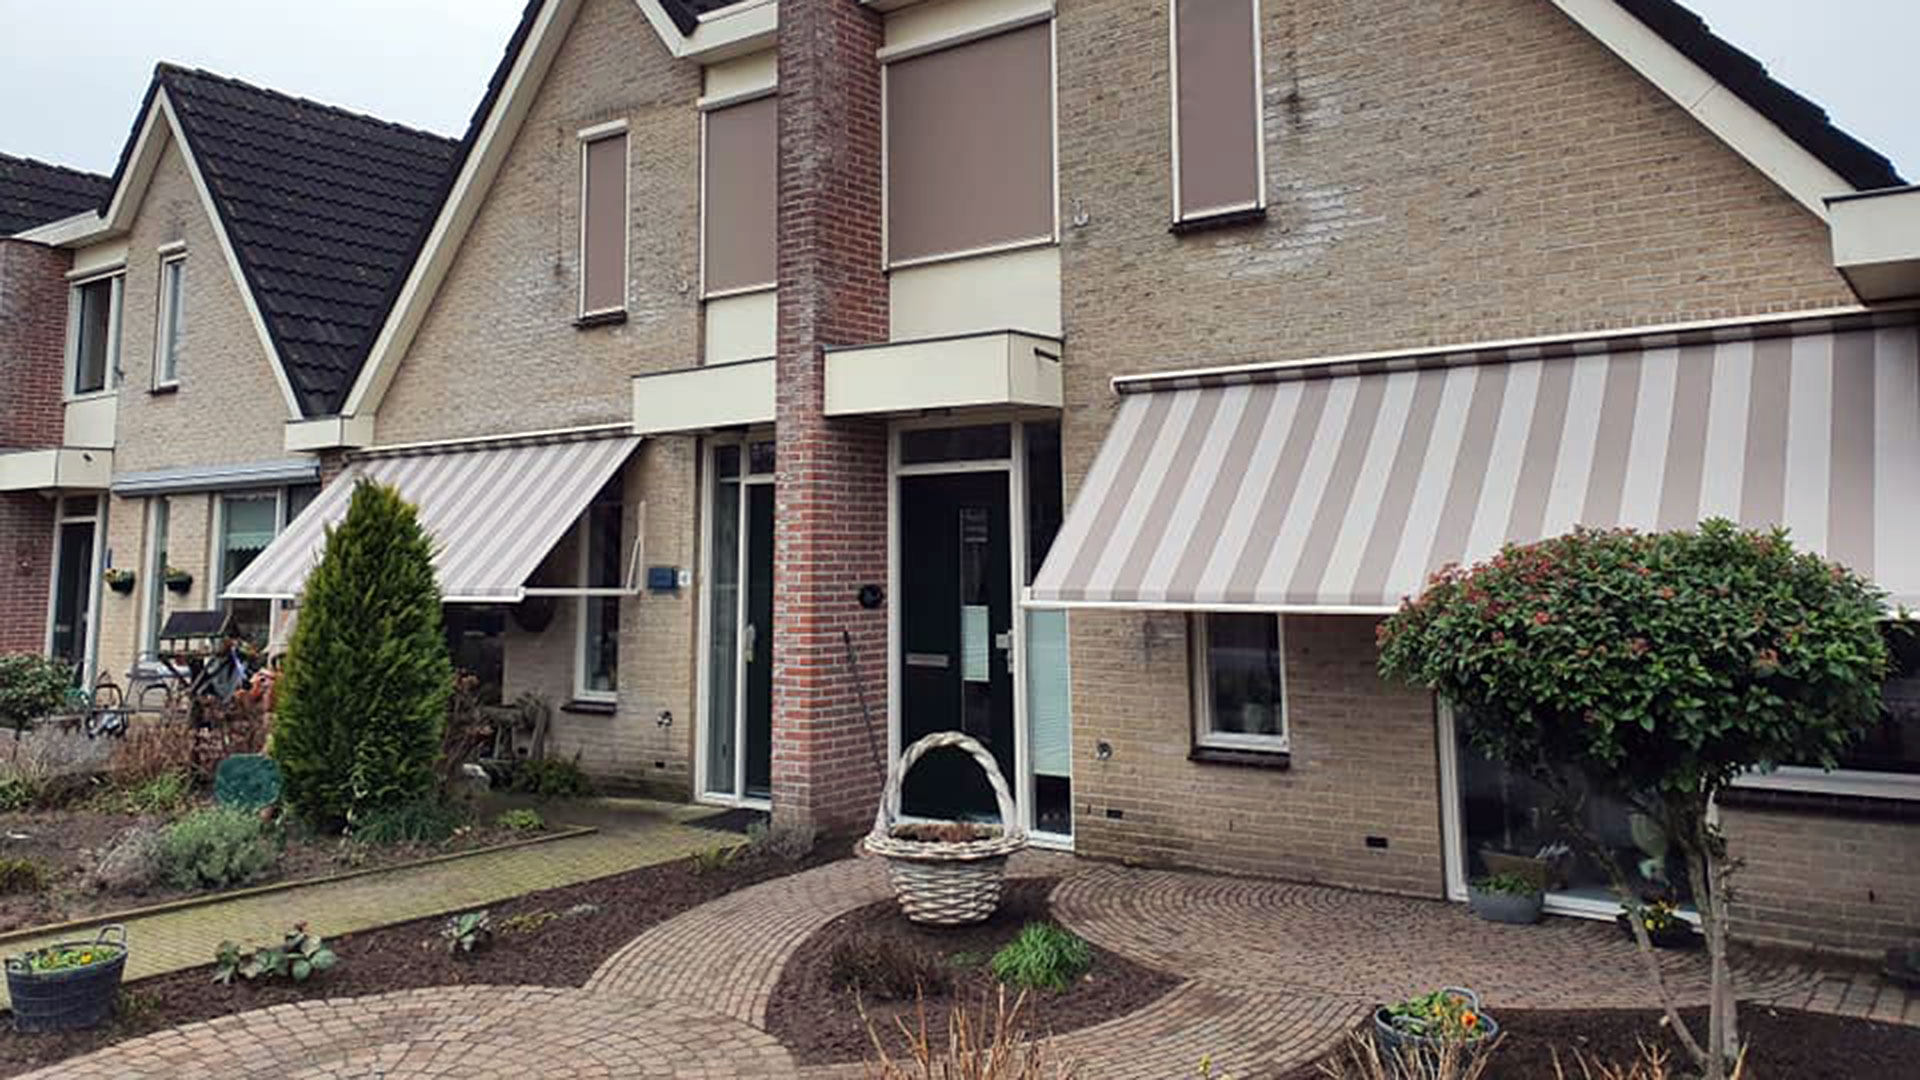 Zonwering - Zonnescherm - Groenevelt Zonwering & Raamdecoratie